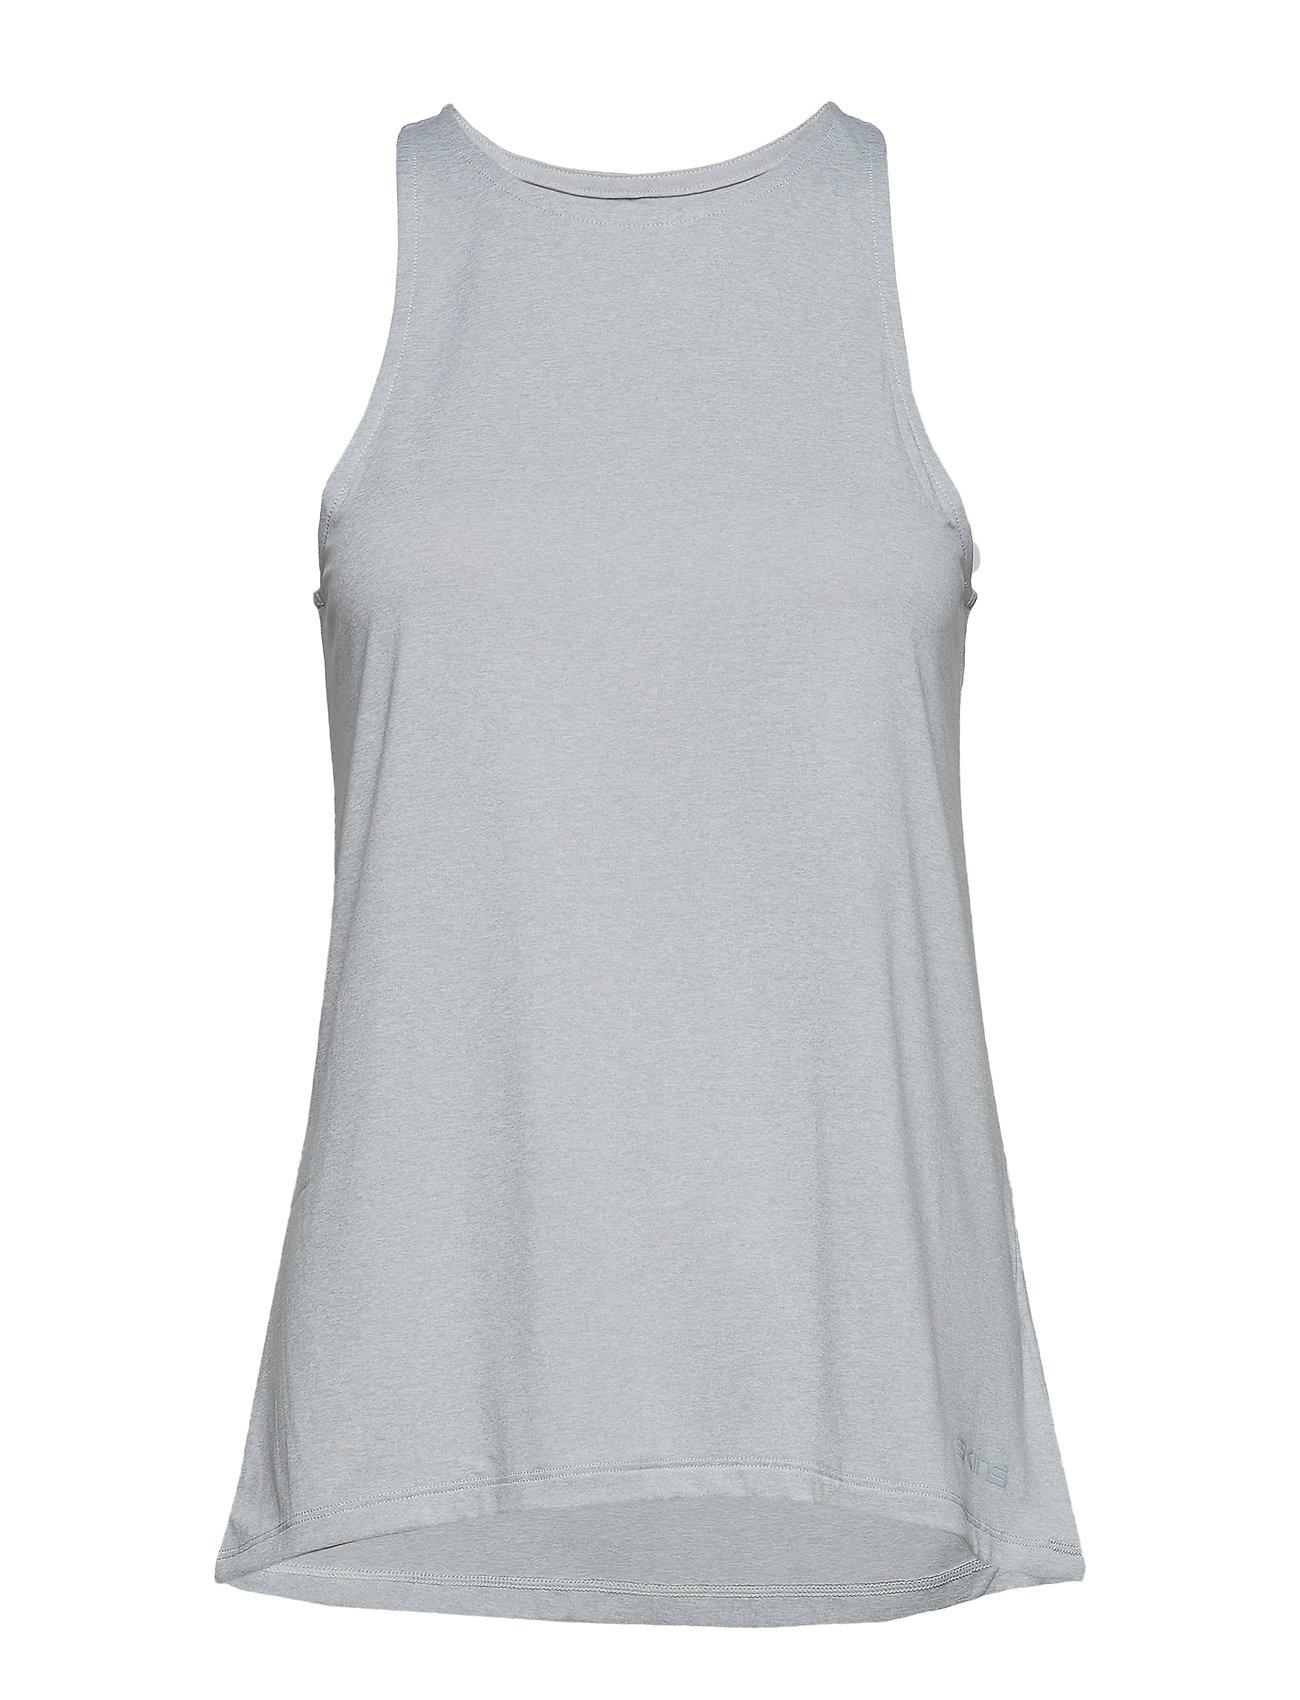 Skins Activewear Siken Womens Tank Top - SILVER MARLE